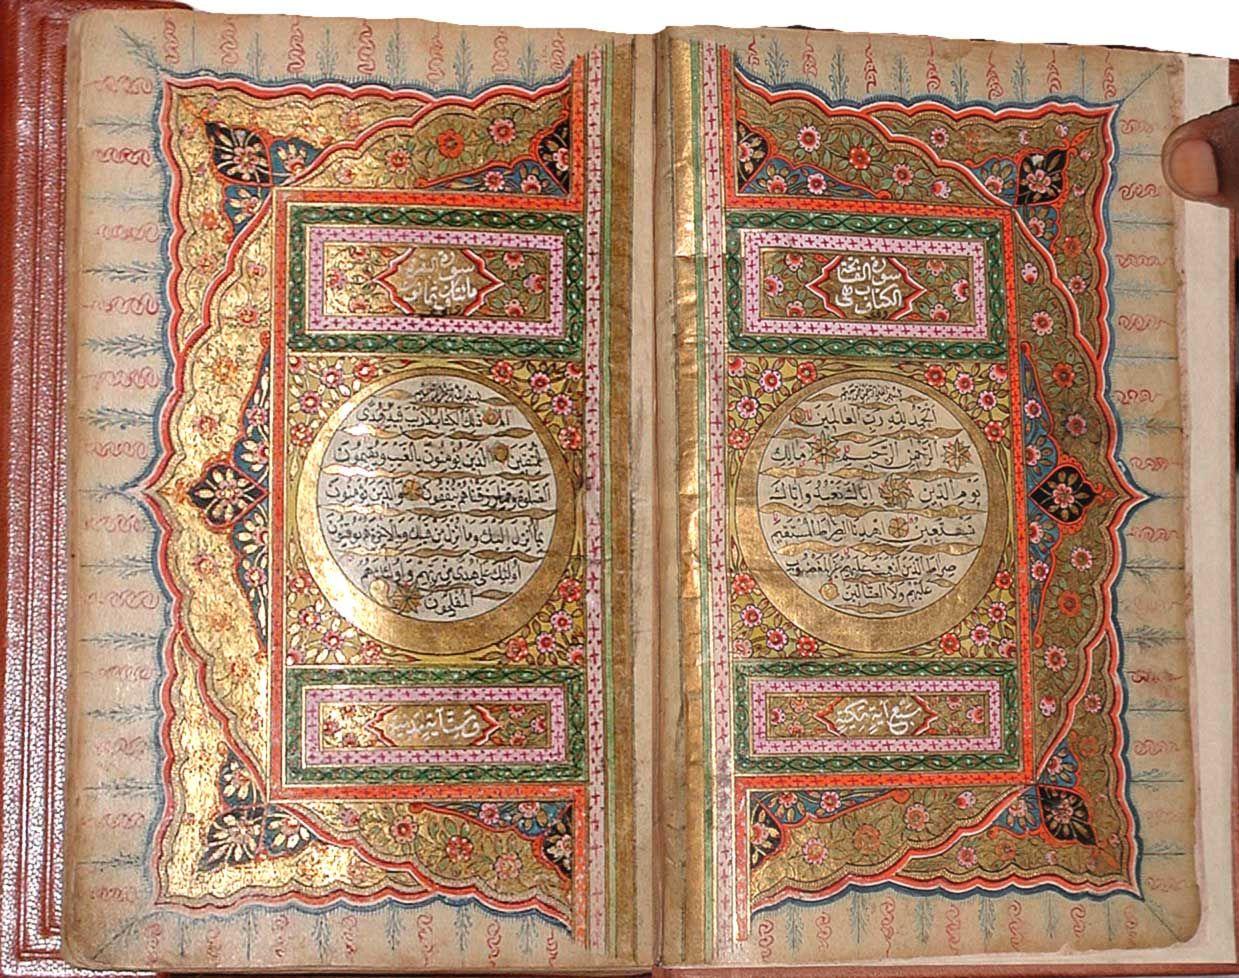 19thCearly-arabic-koran-5c.jpg 1.239×978 piksel